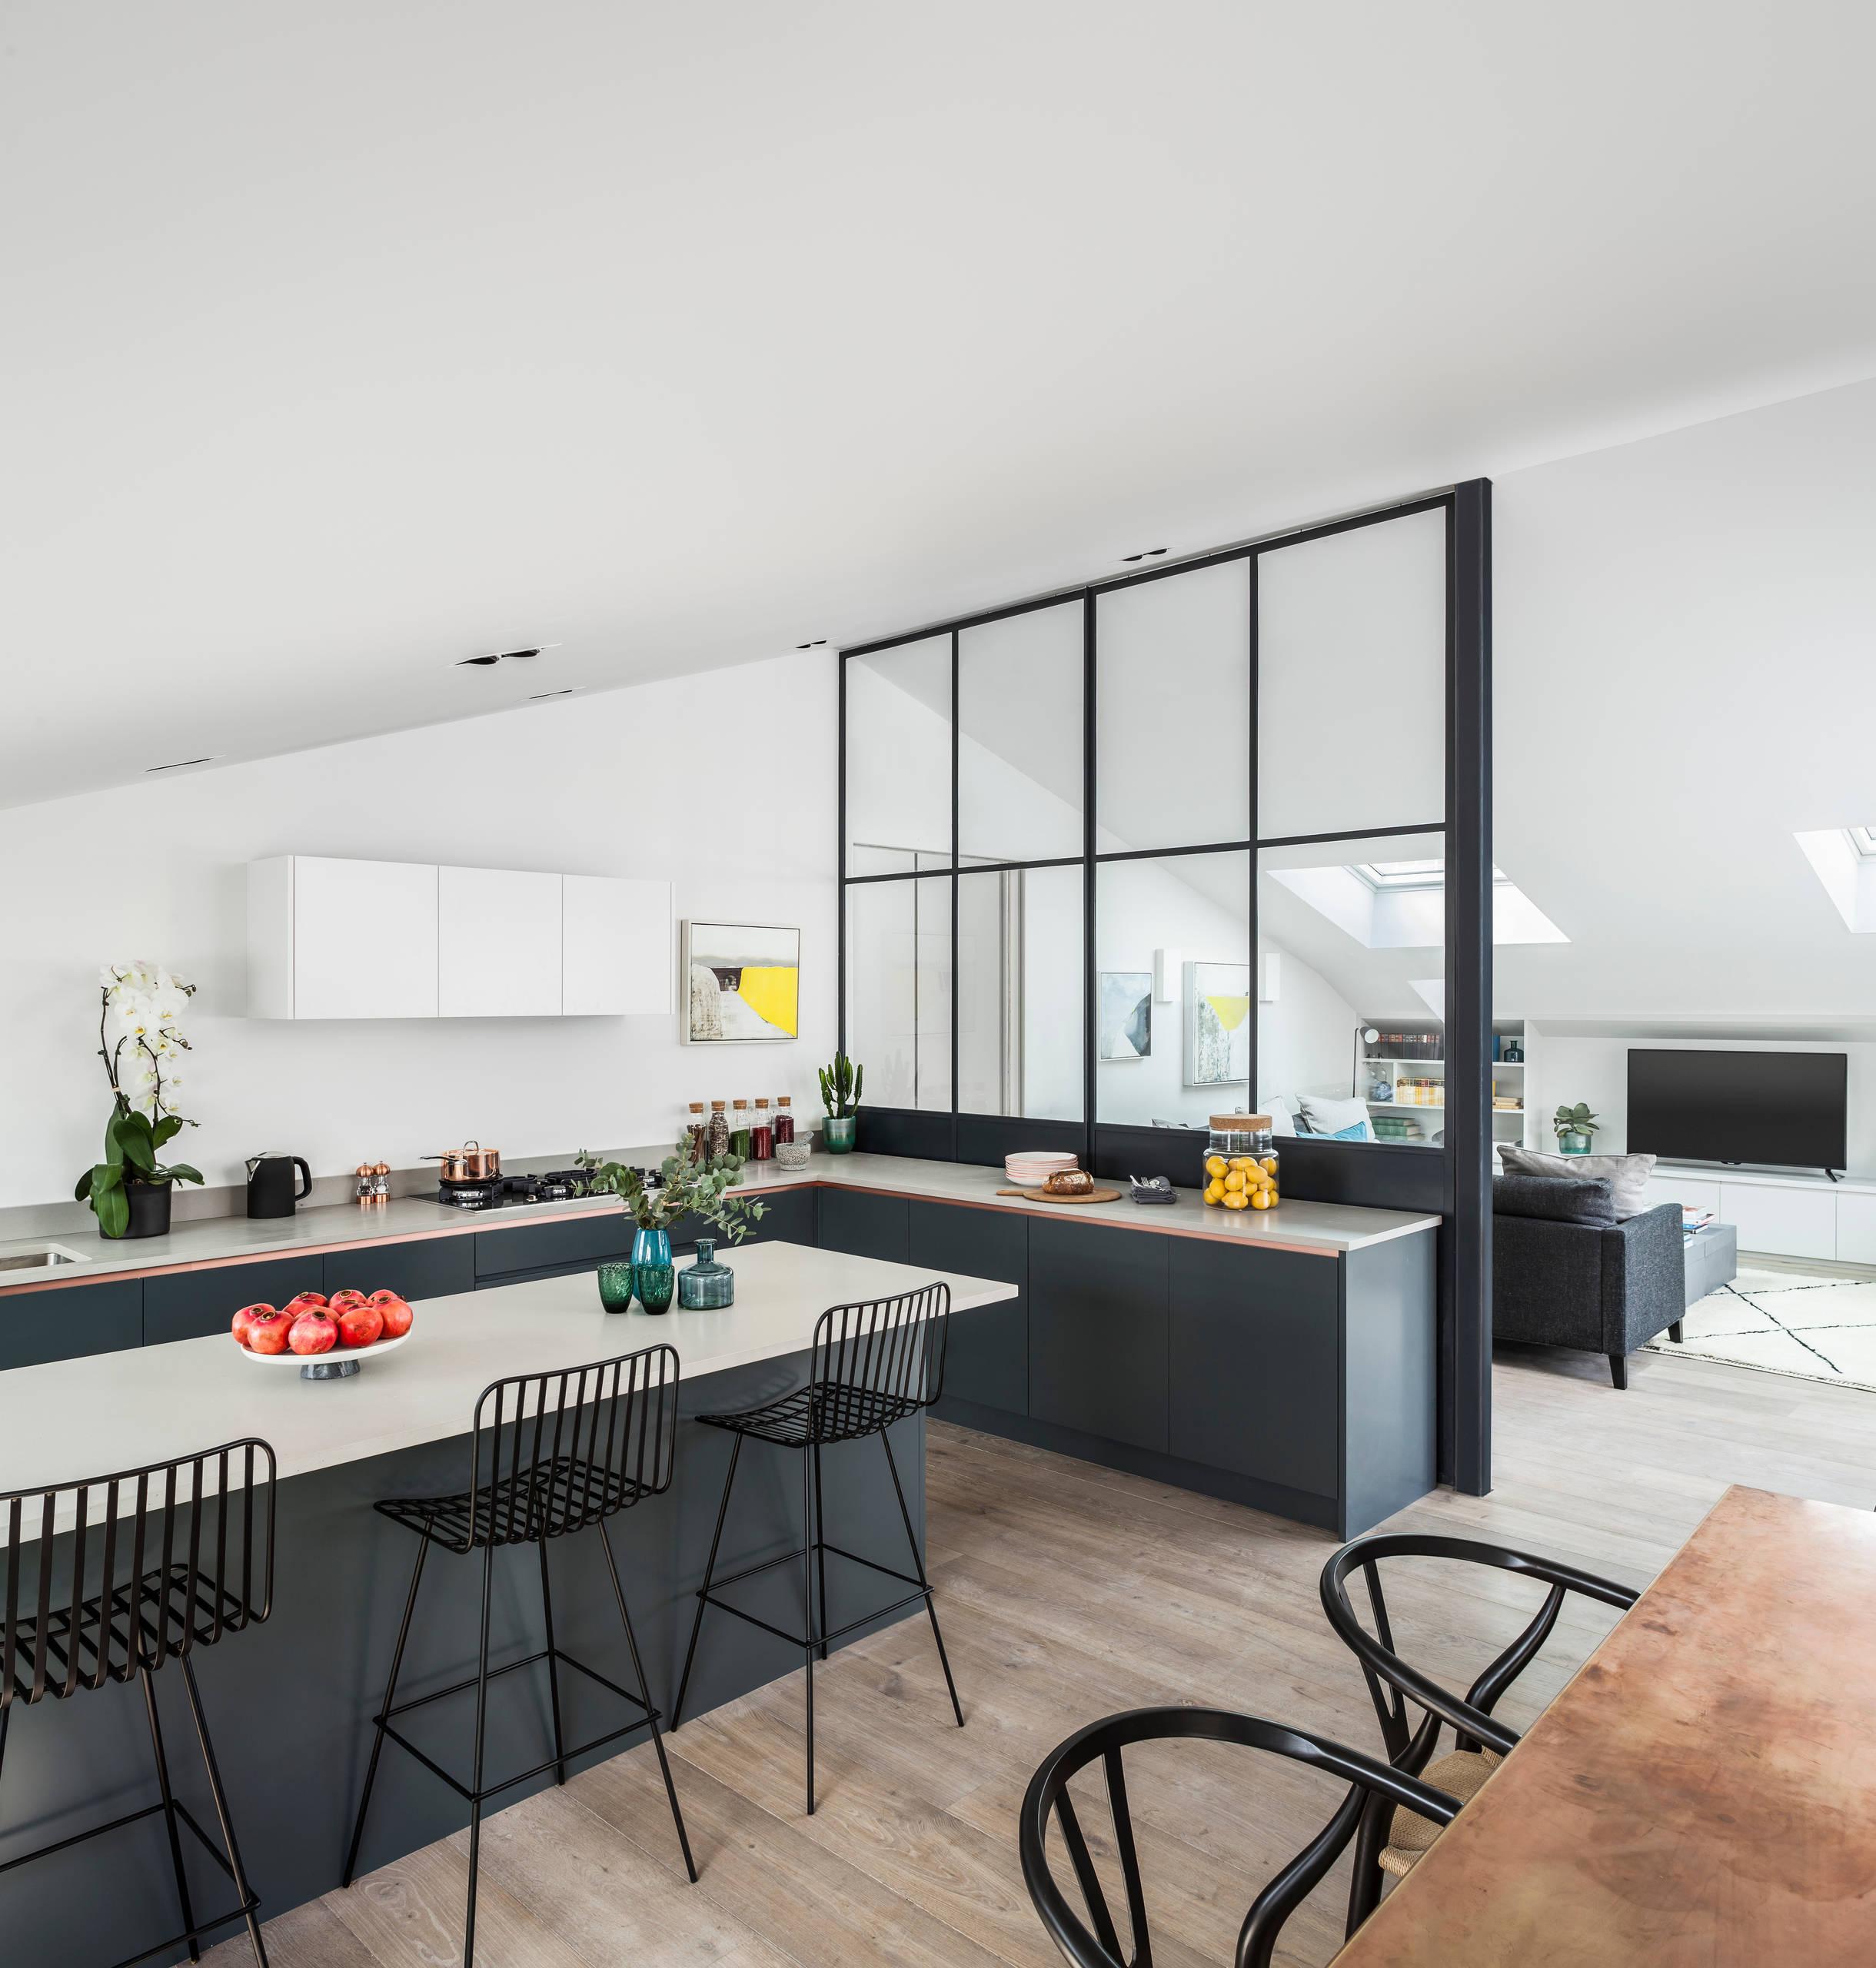 Bakery Place   Modern   Küche   London   von Jo Cowen Architects ...